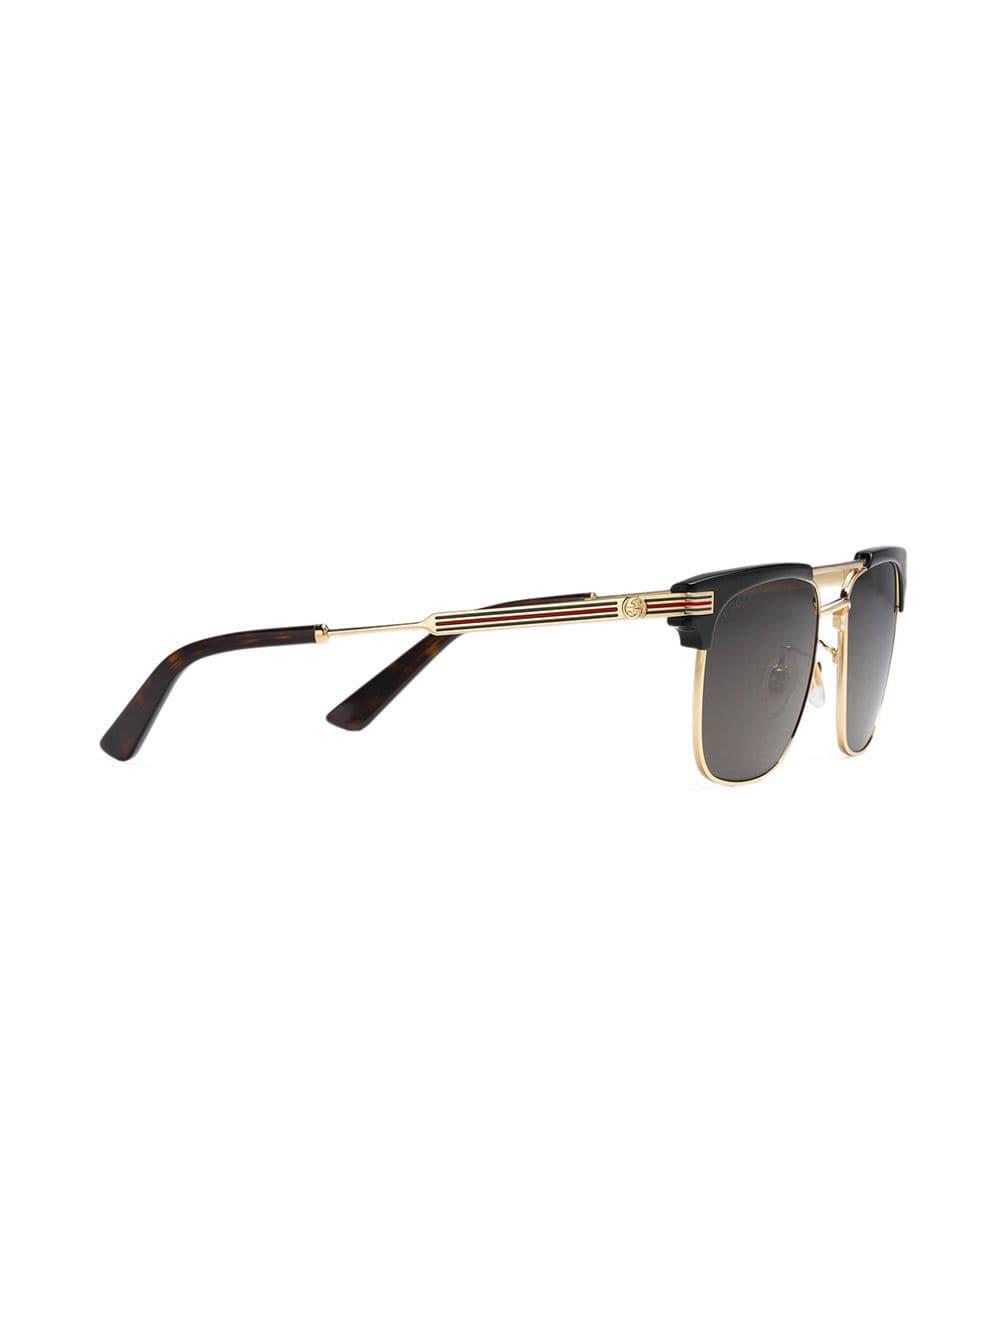 8032aac562 Gucci - Metallic Square-frame Metal Sunglasses for Men - Lyst. View  fullscreen